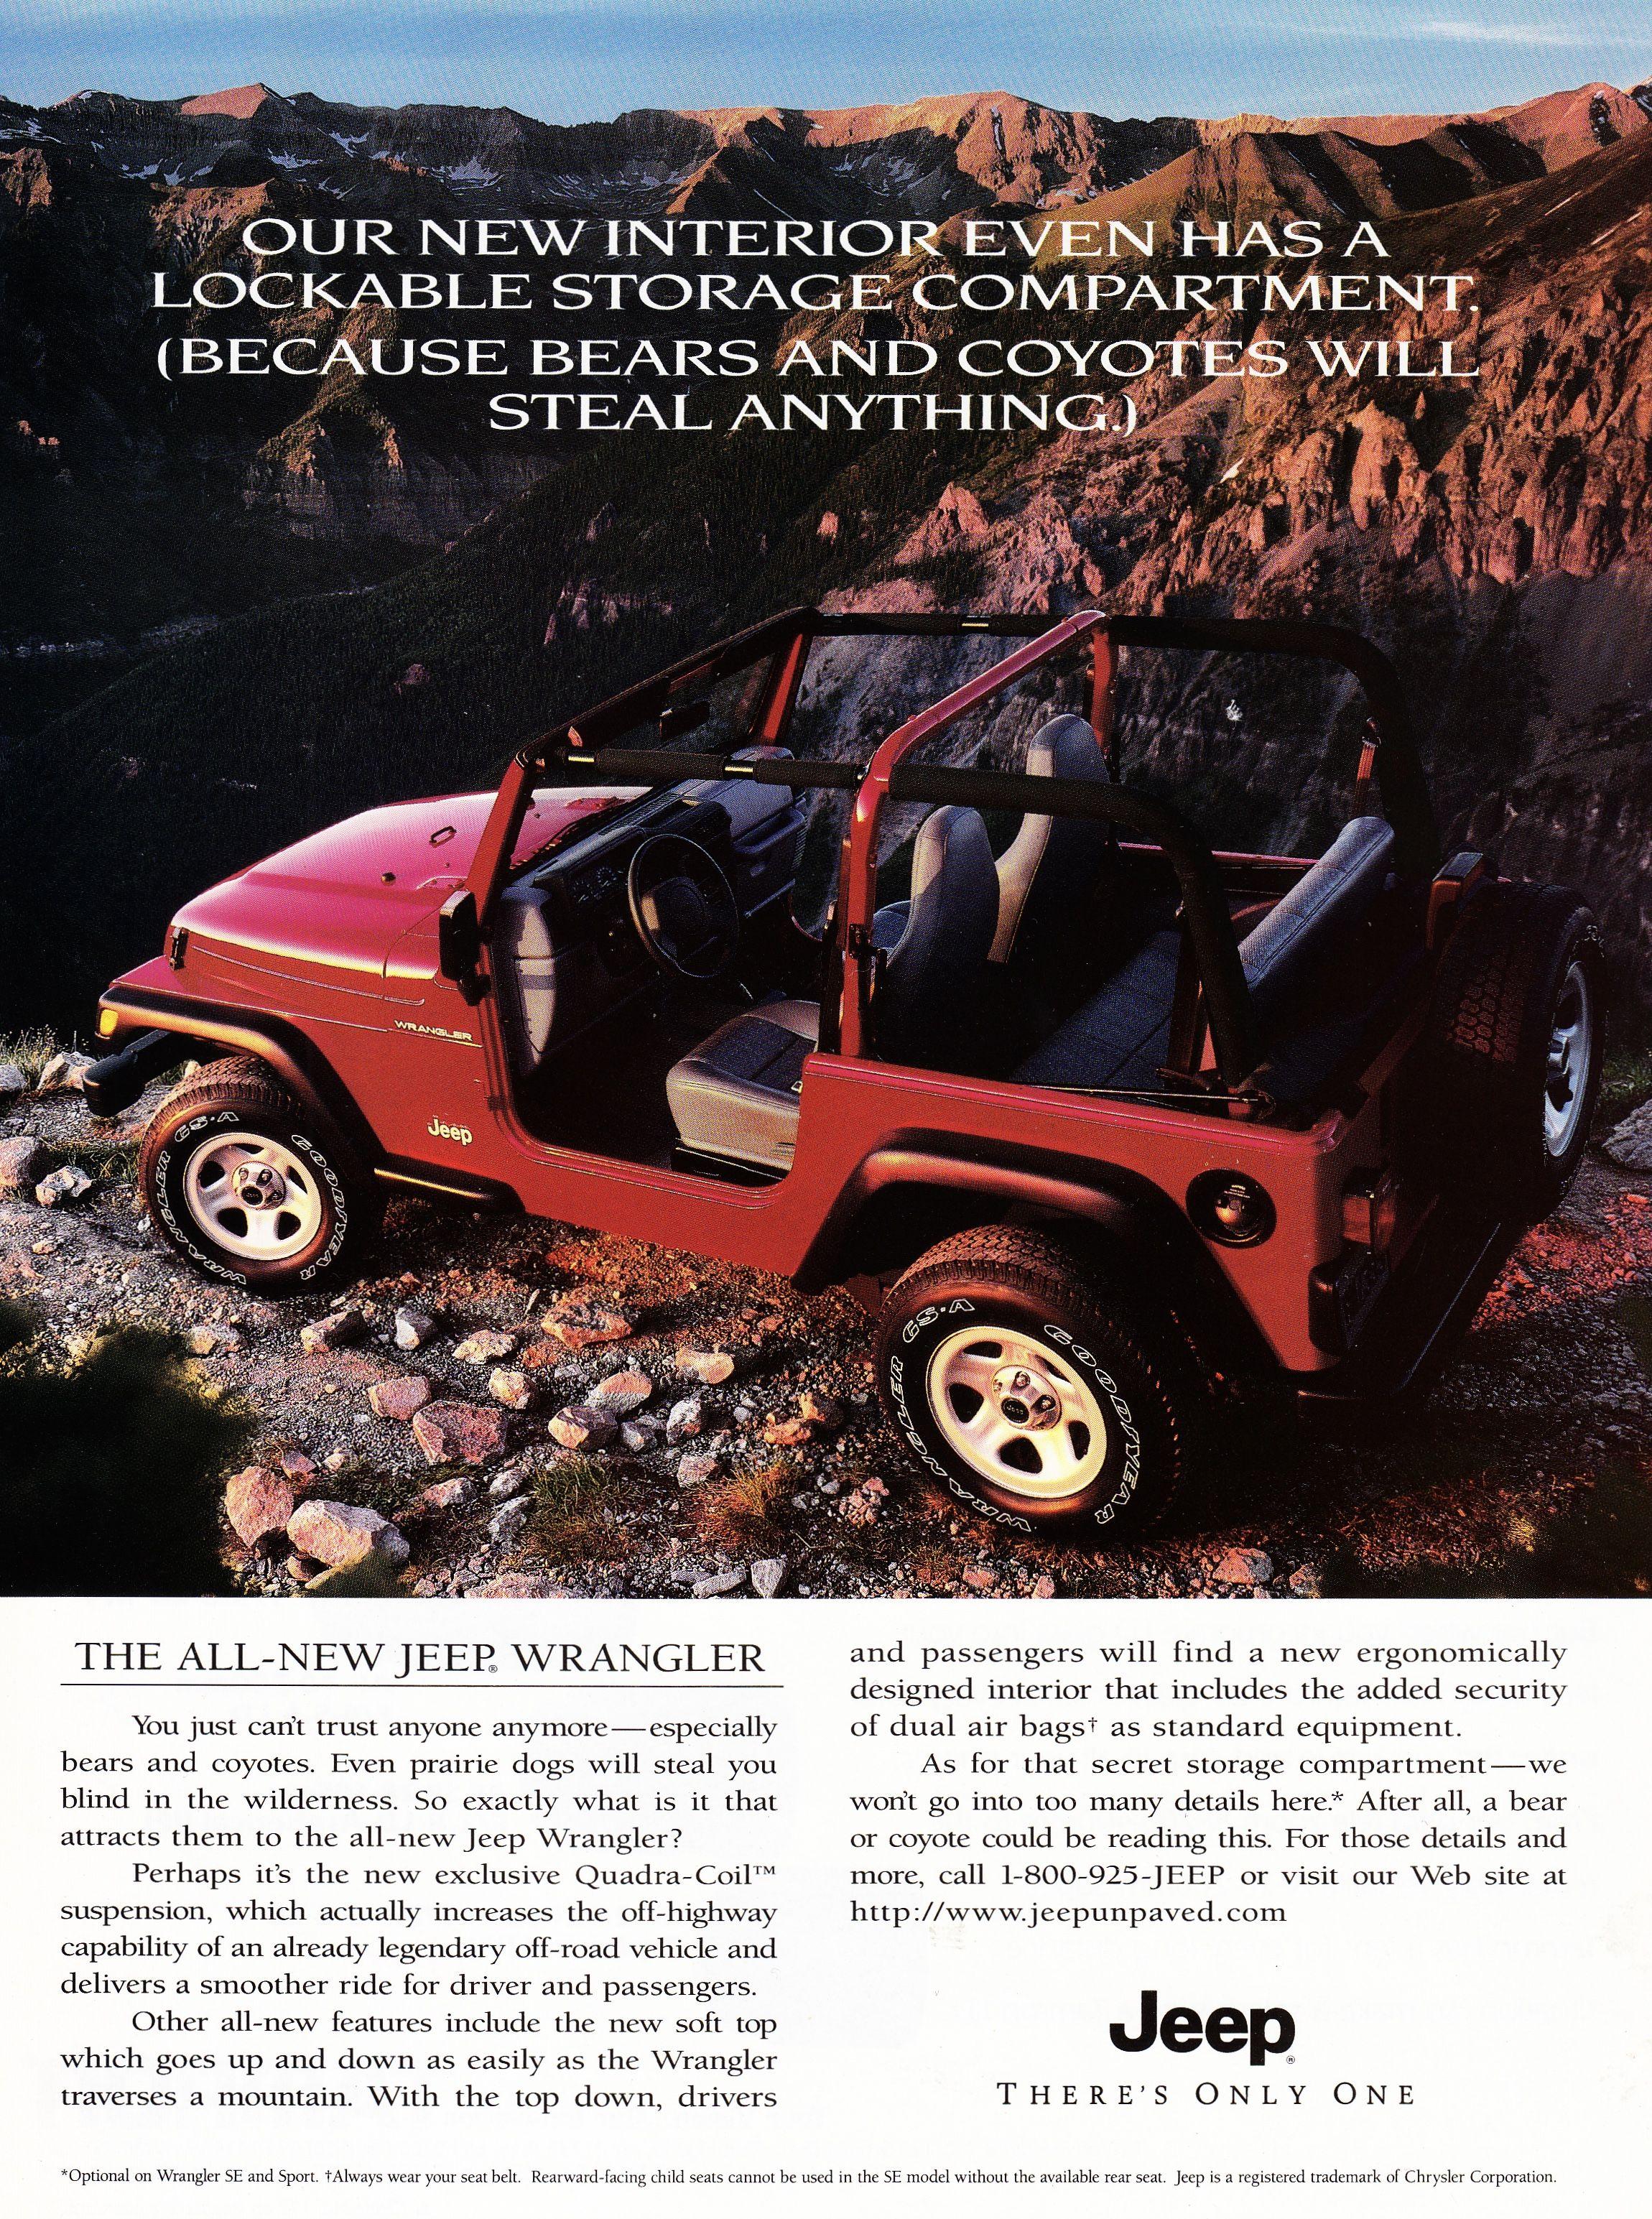 1997 Jeep Wrangler 1997 Jeep Wrangler Jeep Wrangler